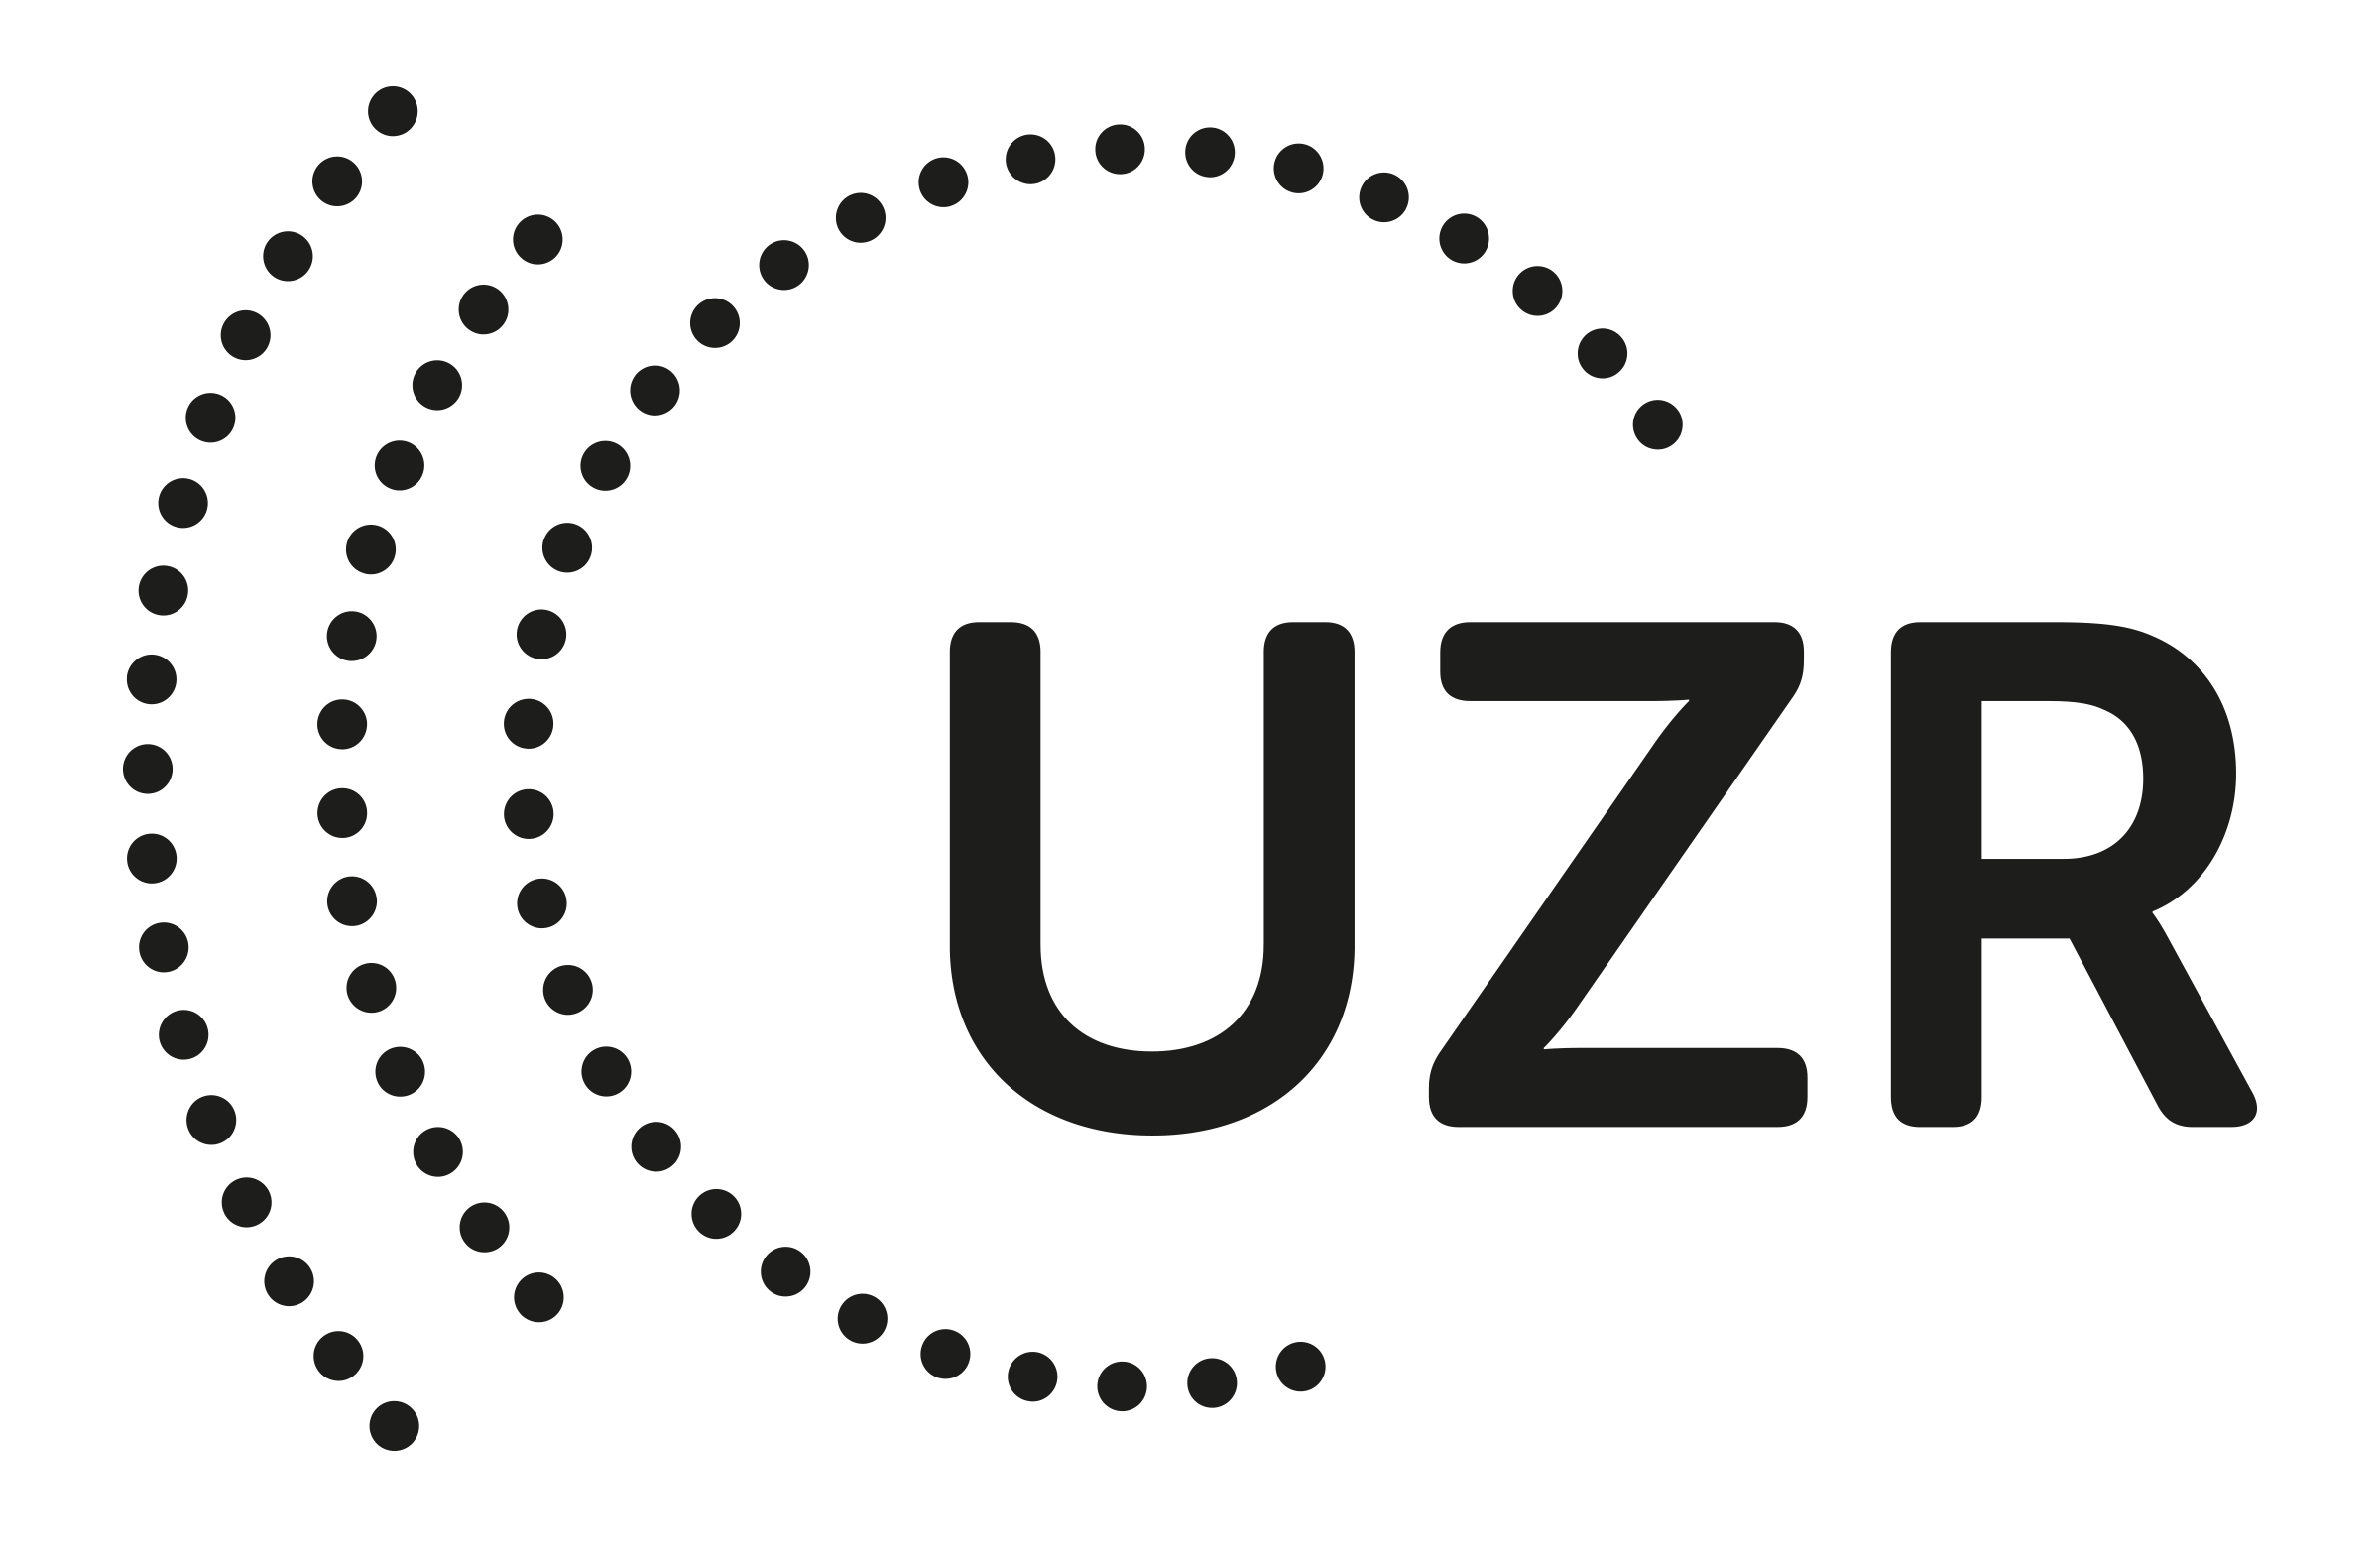 uzr-logo